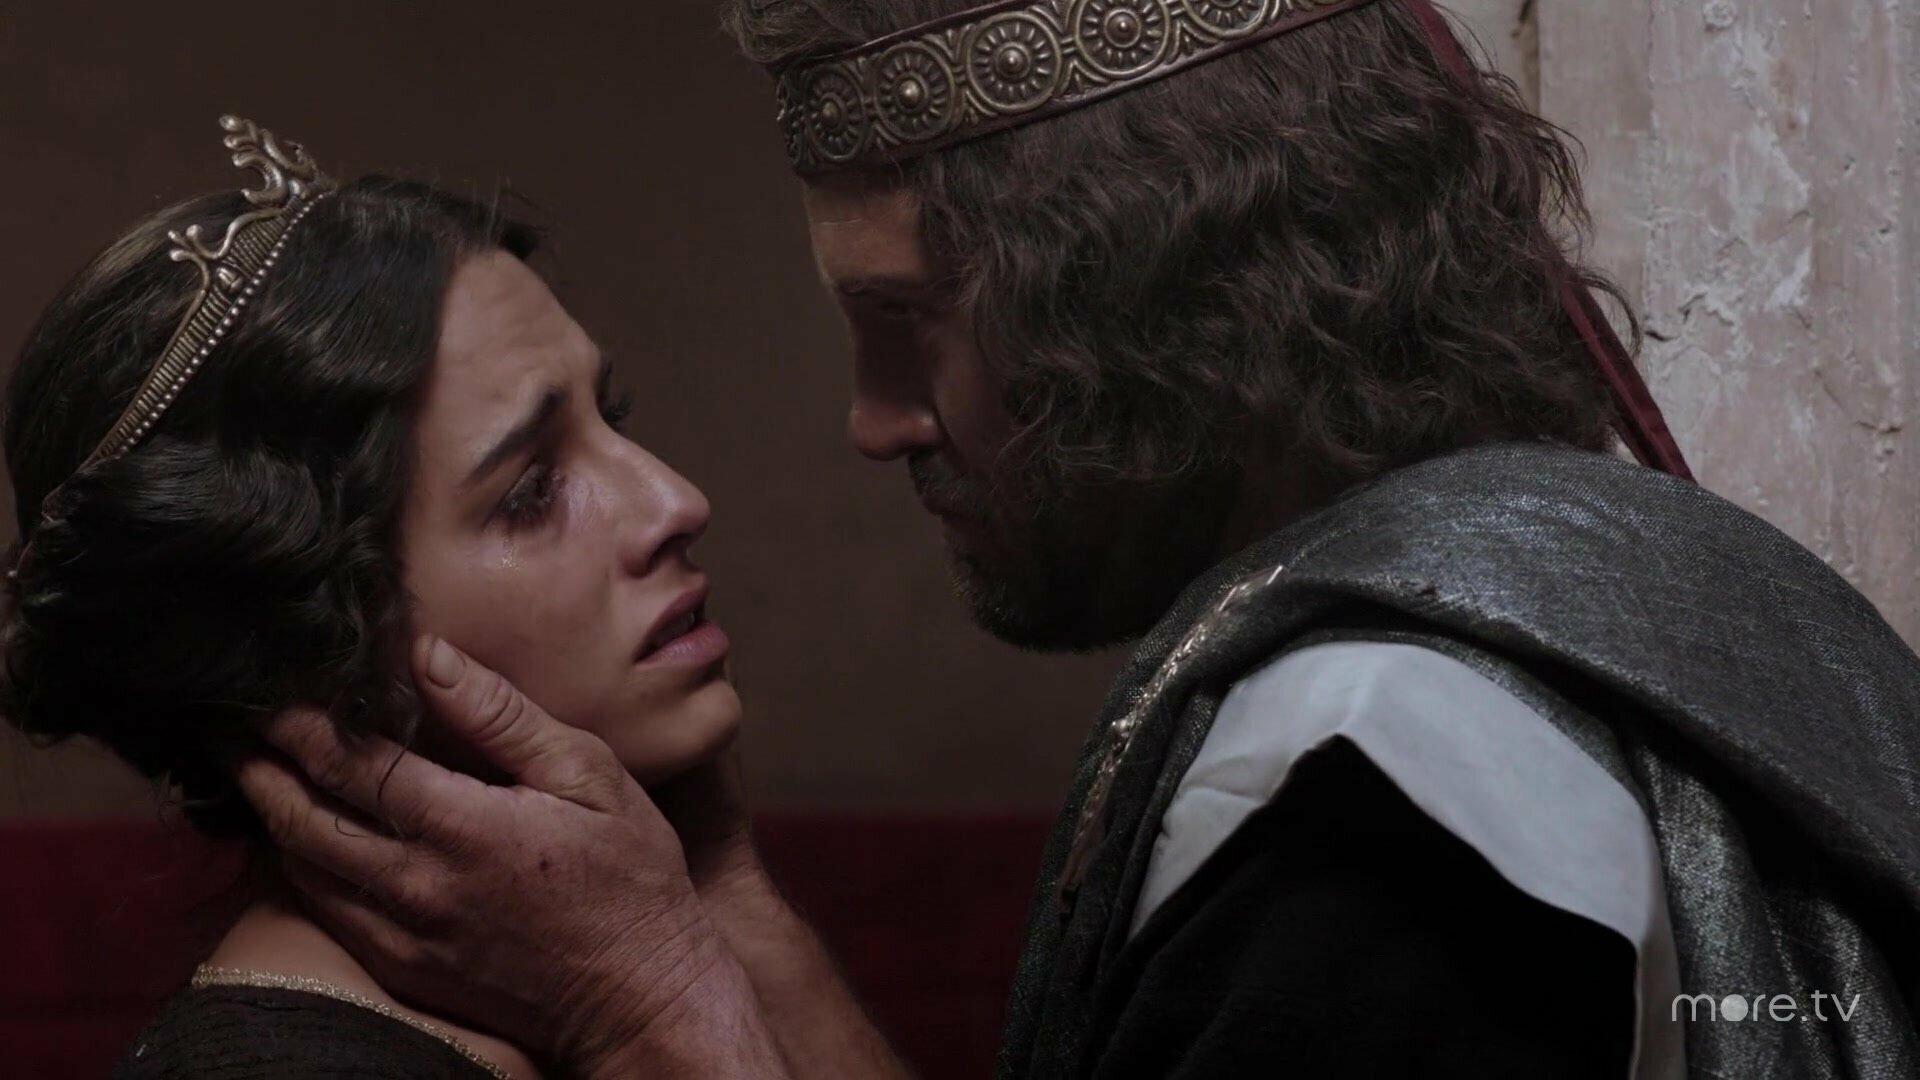 The Bible — s01e04 — Kingdom